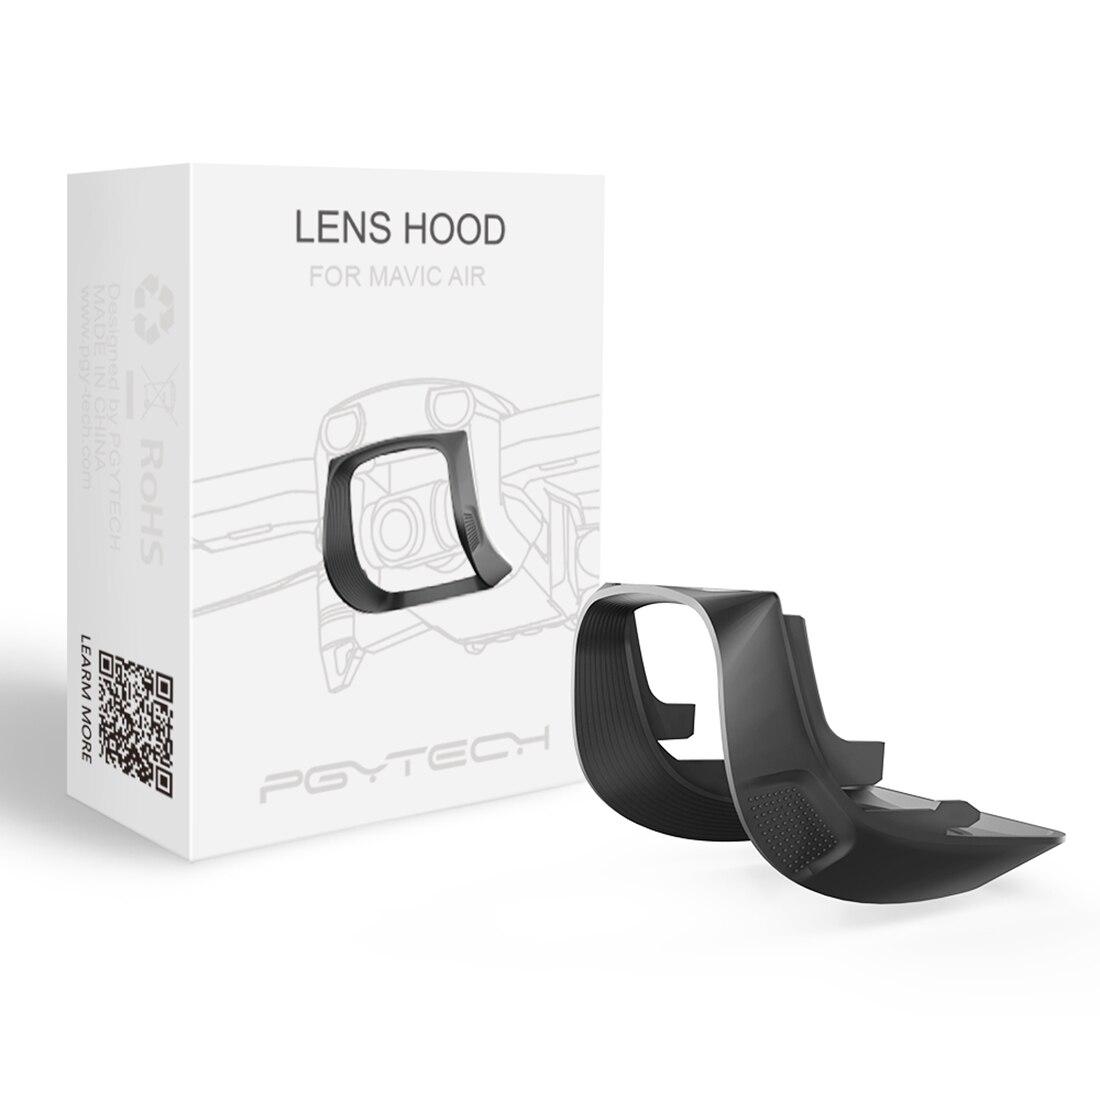 PGYTECH Anti-glare Protective Cover Lens Sun Hood Sunshade for DJI Mavic Air Lens Camera Drone Accessories